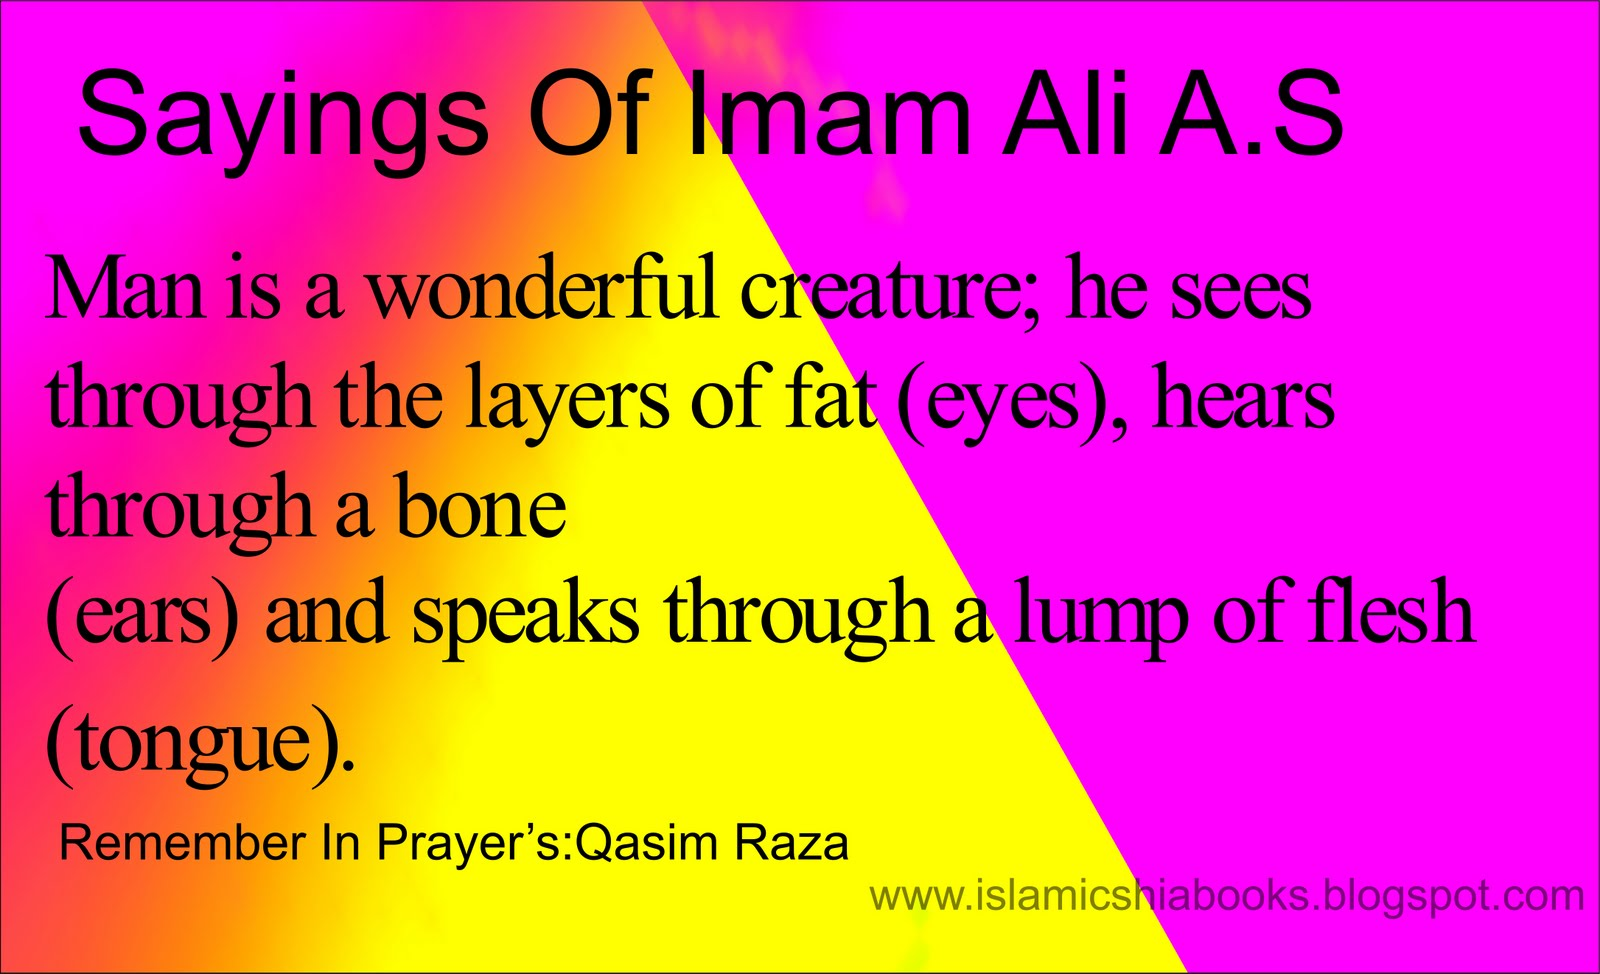 Hazrat ali book in hindi pdf